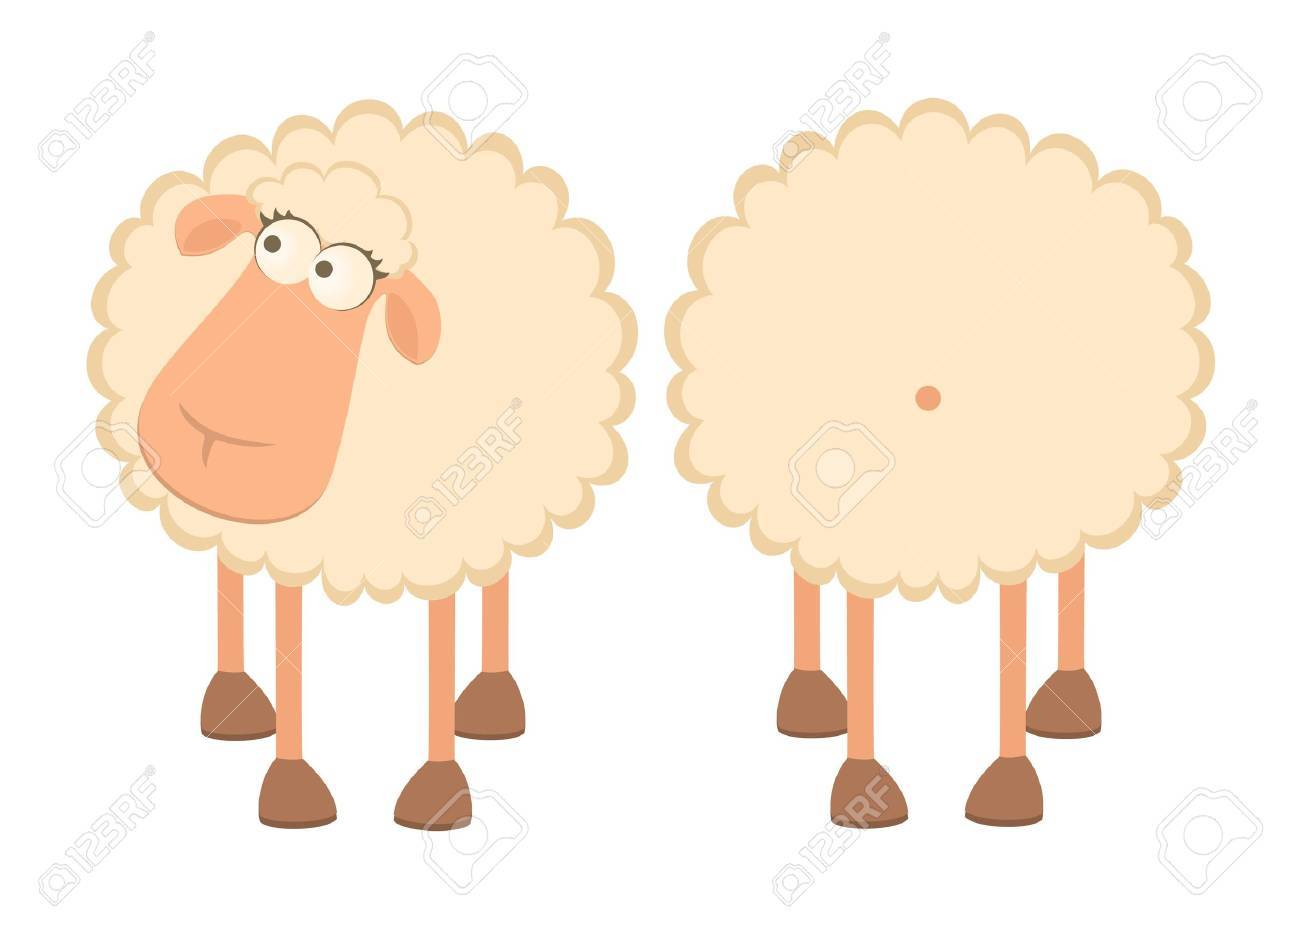 illustration of two cartoon sheep Stock Photo - 7414740